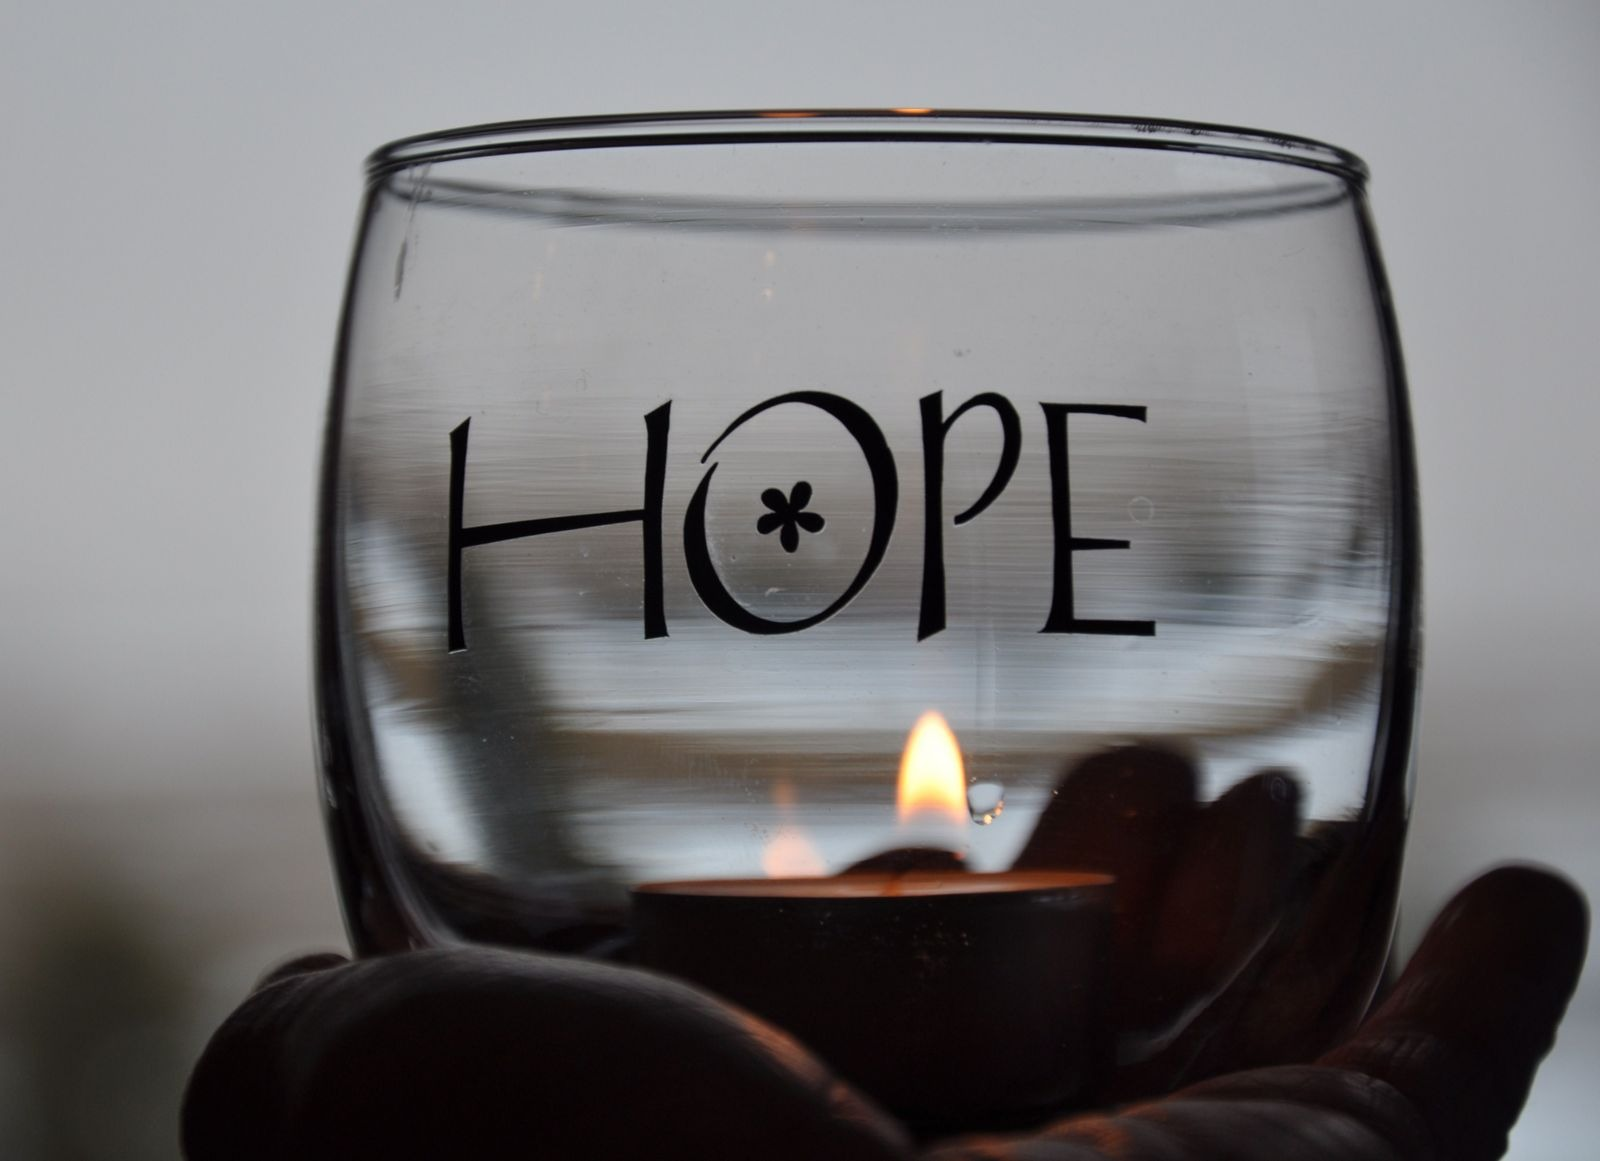 http://shbabbek.com/upload/#اصطباحة النهاردة: اوعى تيأس.. الأغاني دي هتديك جرعة أمل